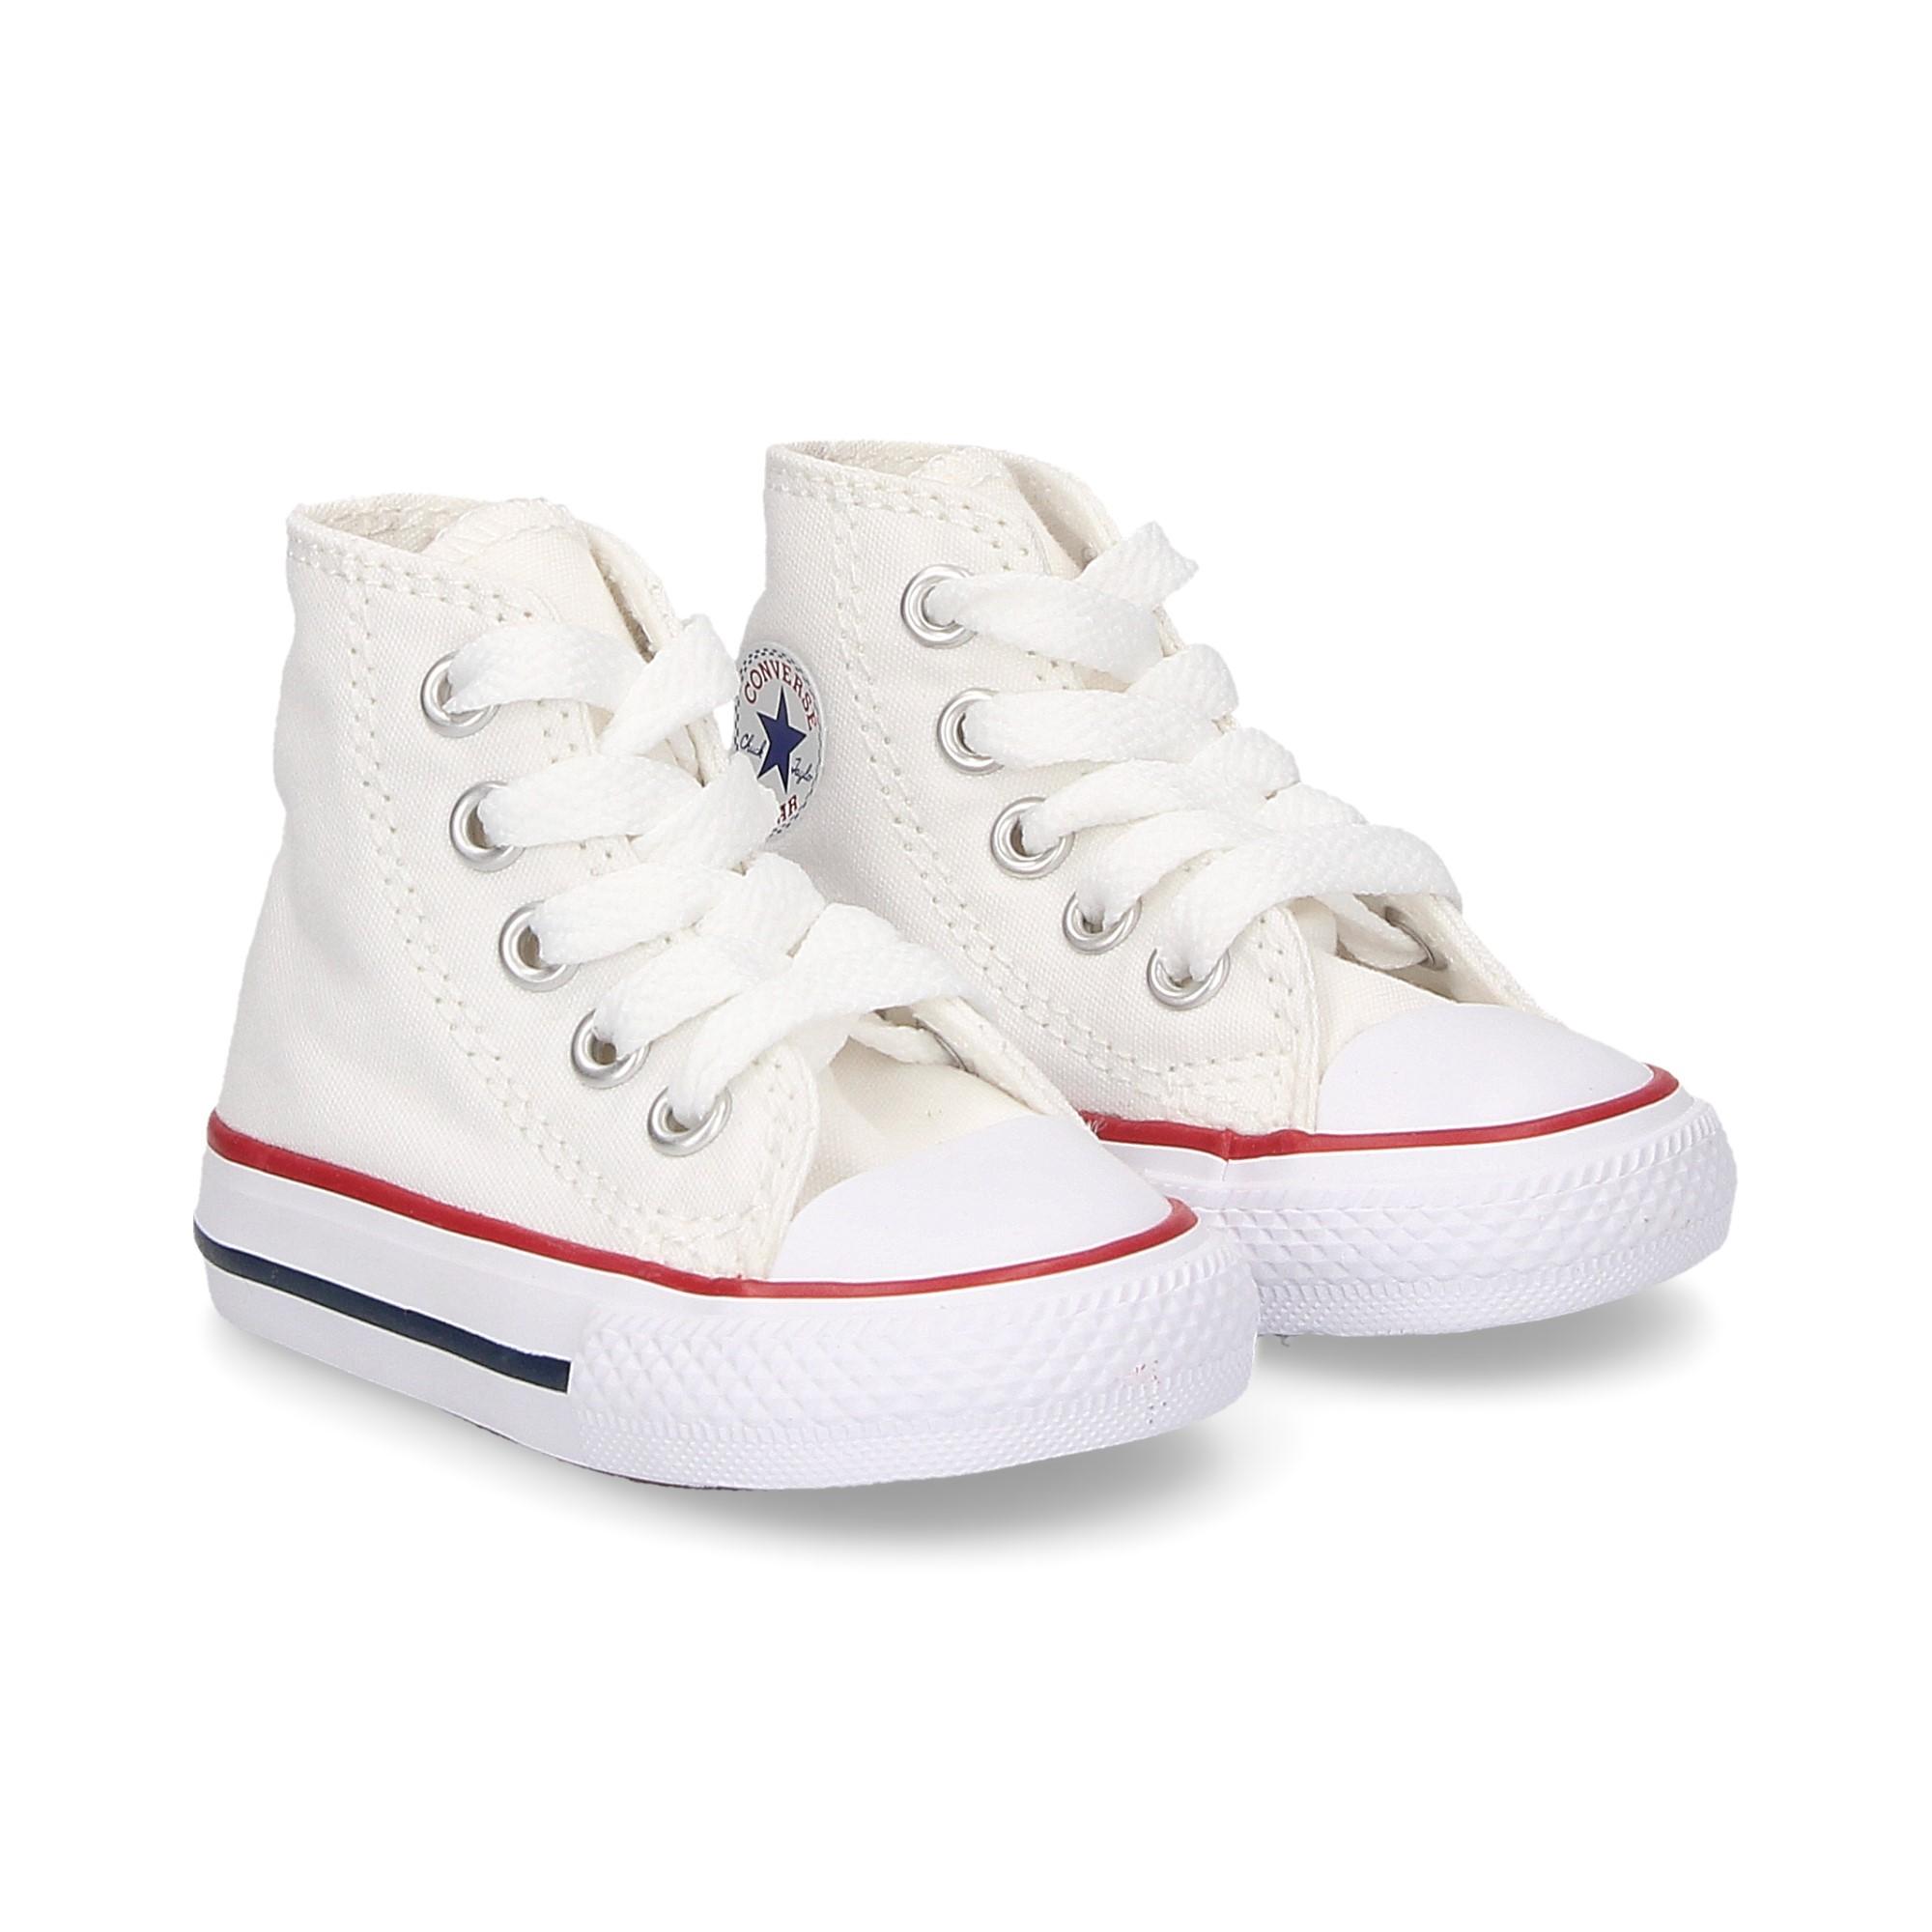 03156294799 CONVERSE Boys Sneakers 7J253C BLANCO